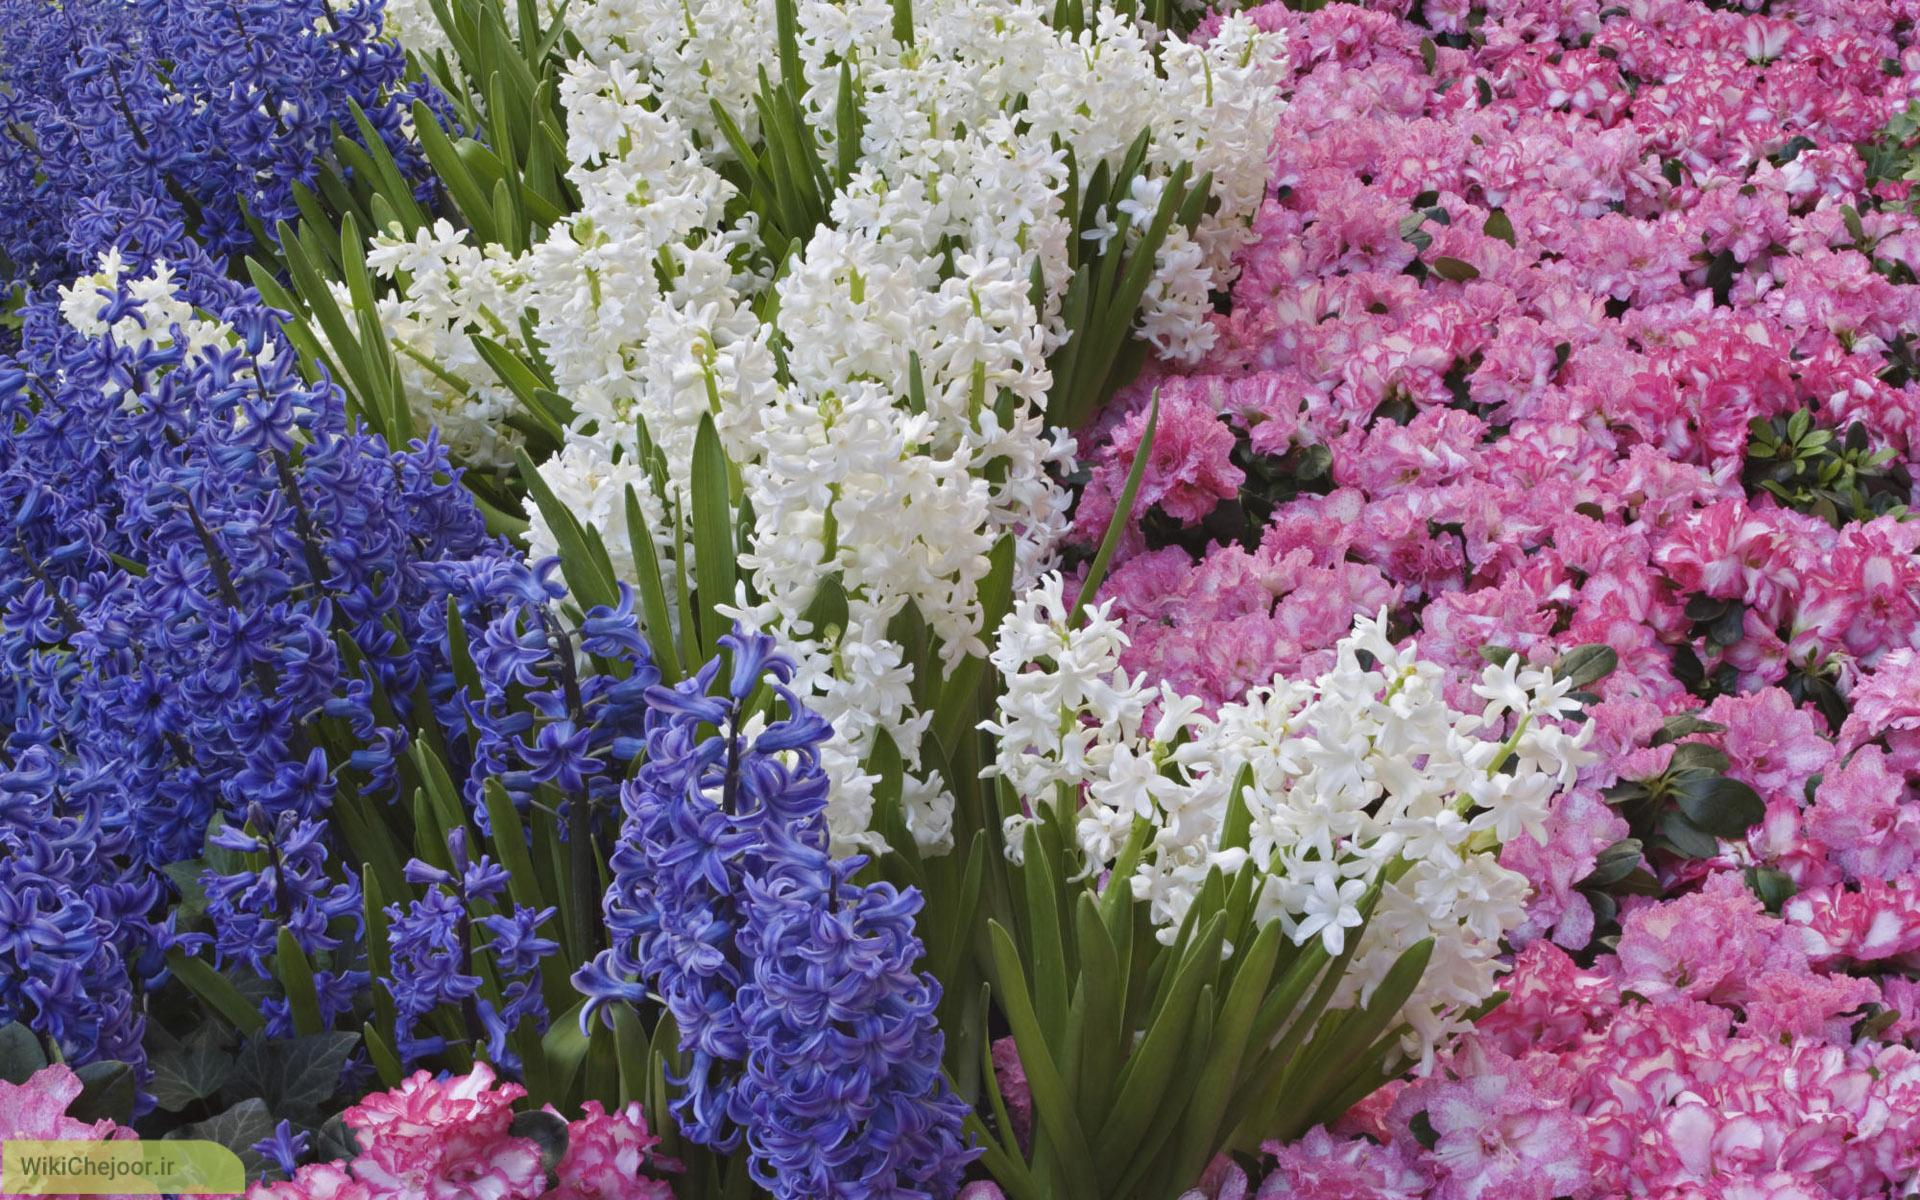 چگونه گل سنبل پرورش دهیم؟